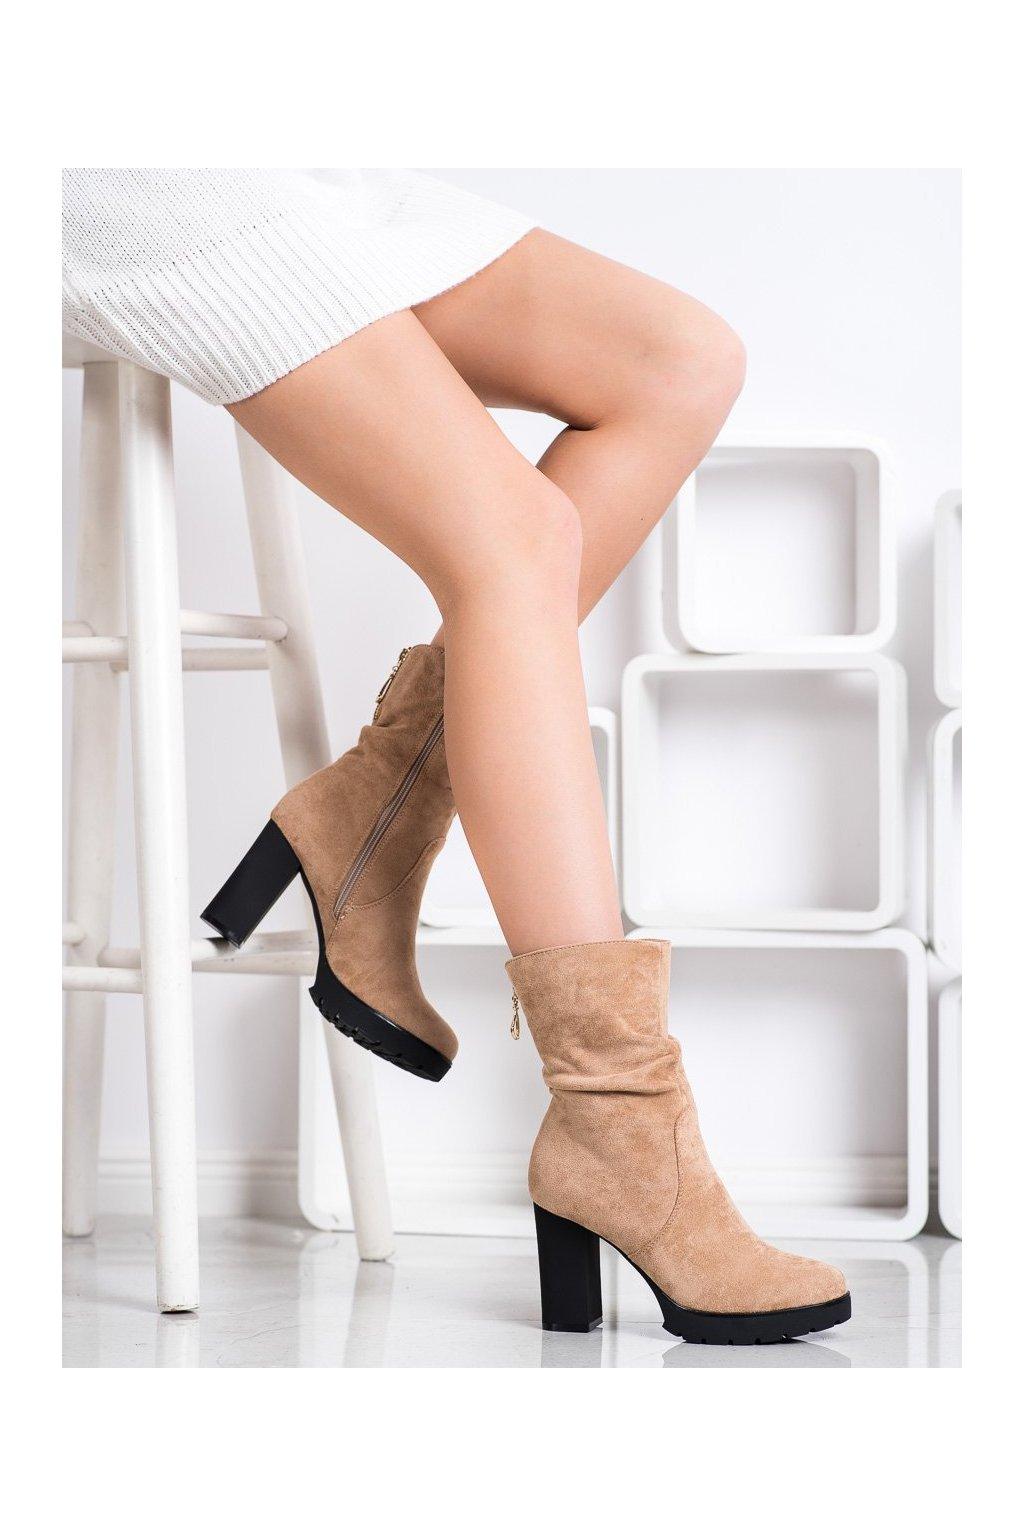 Hnedé dámske topánky Bella paris kod A5800KH